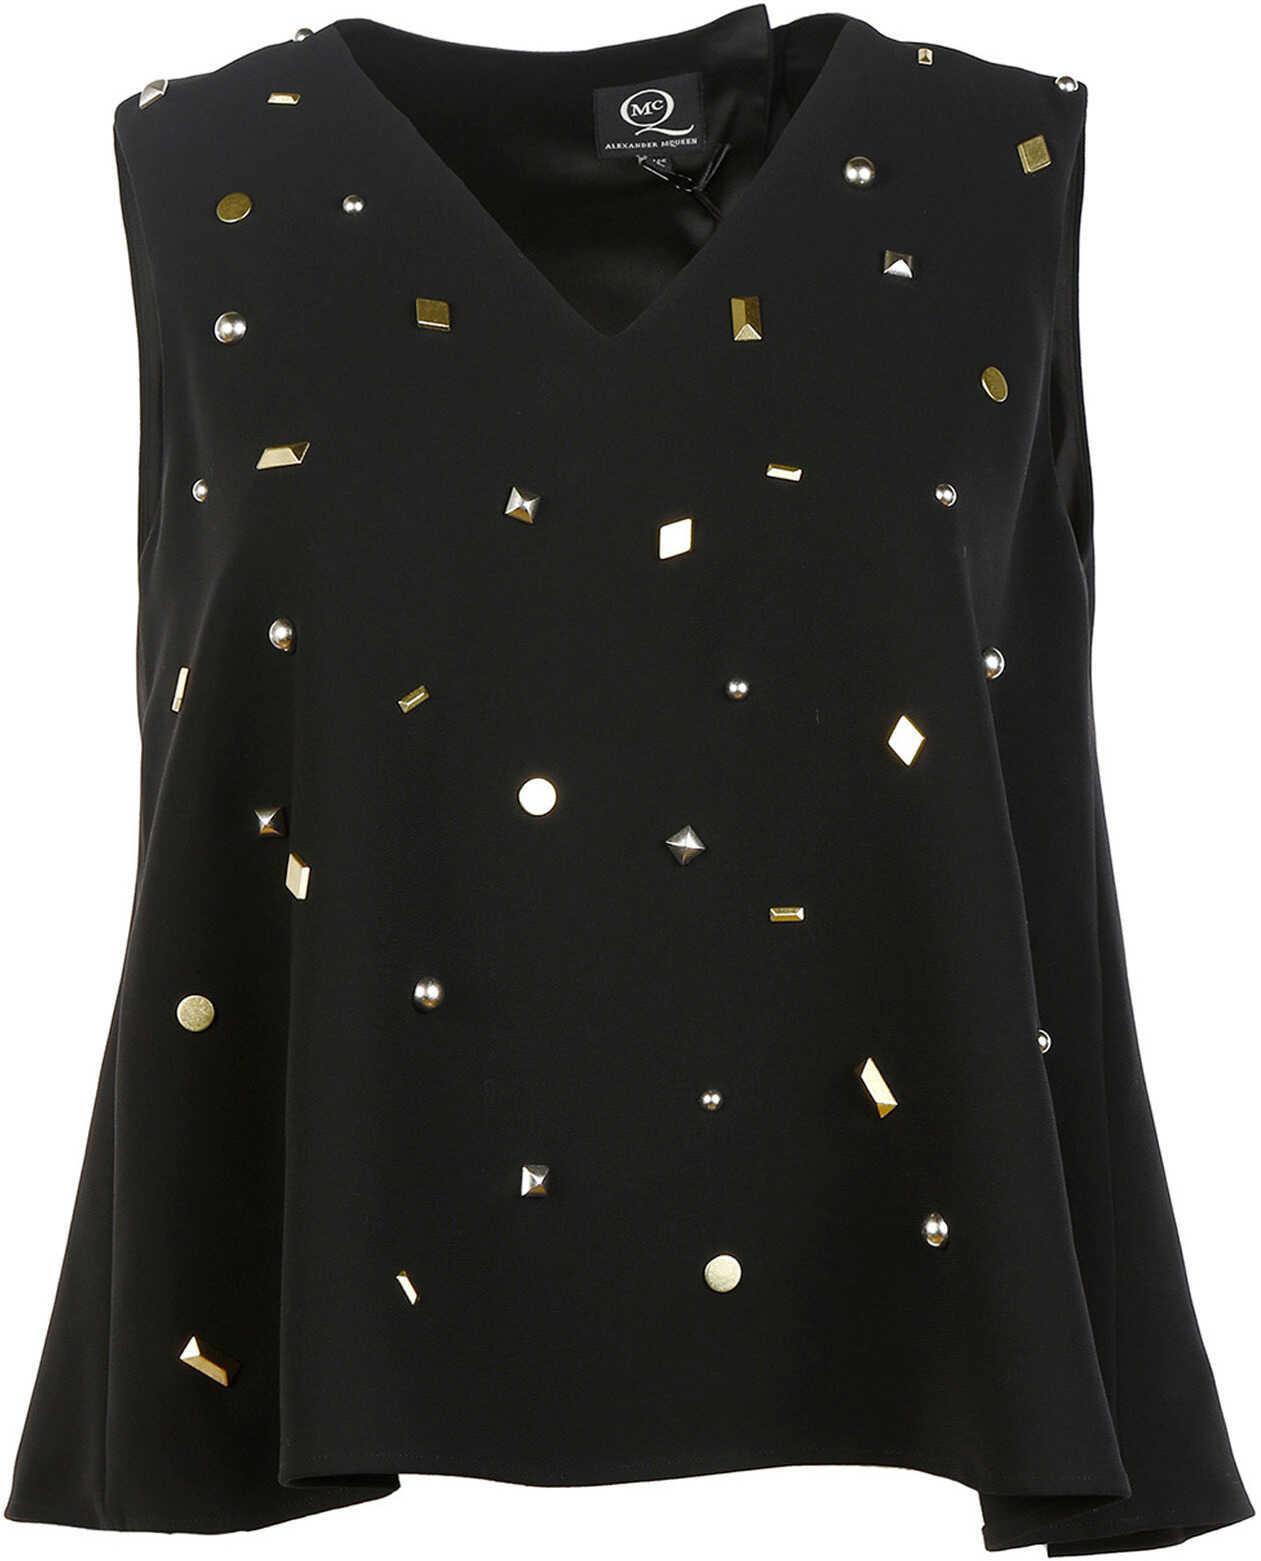 Alexander McQueen Sleeveless Studded Black